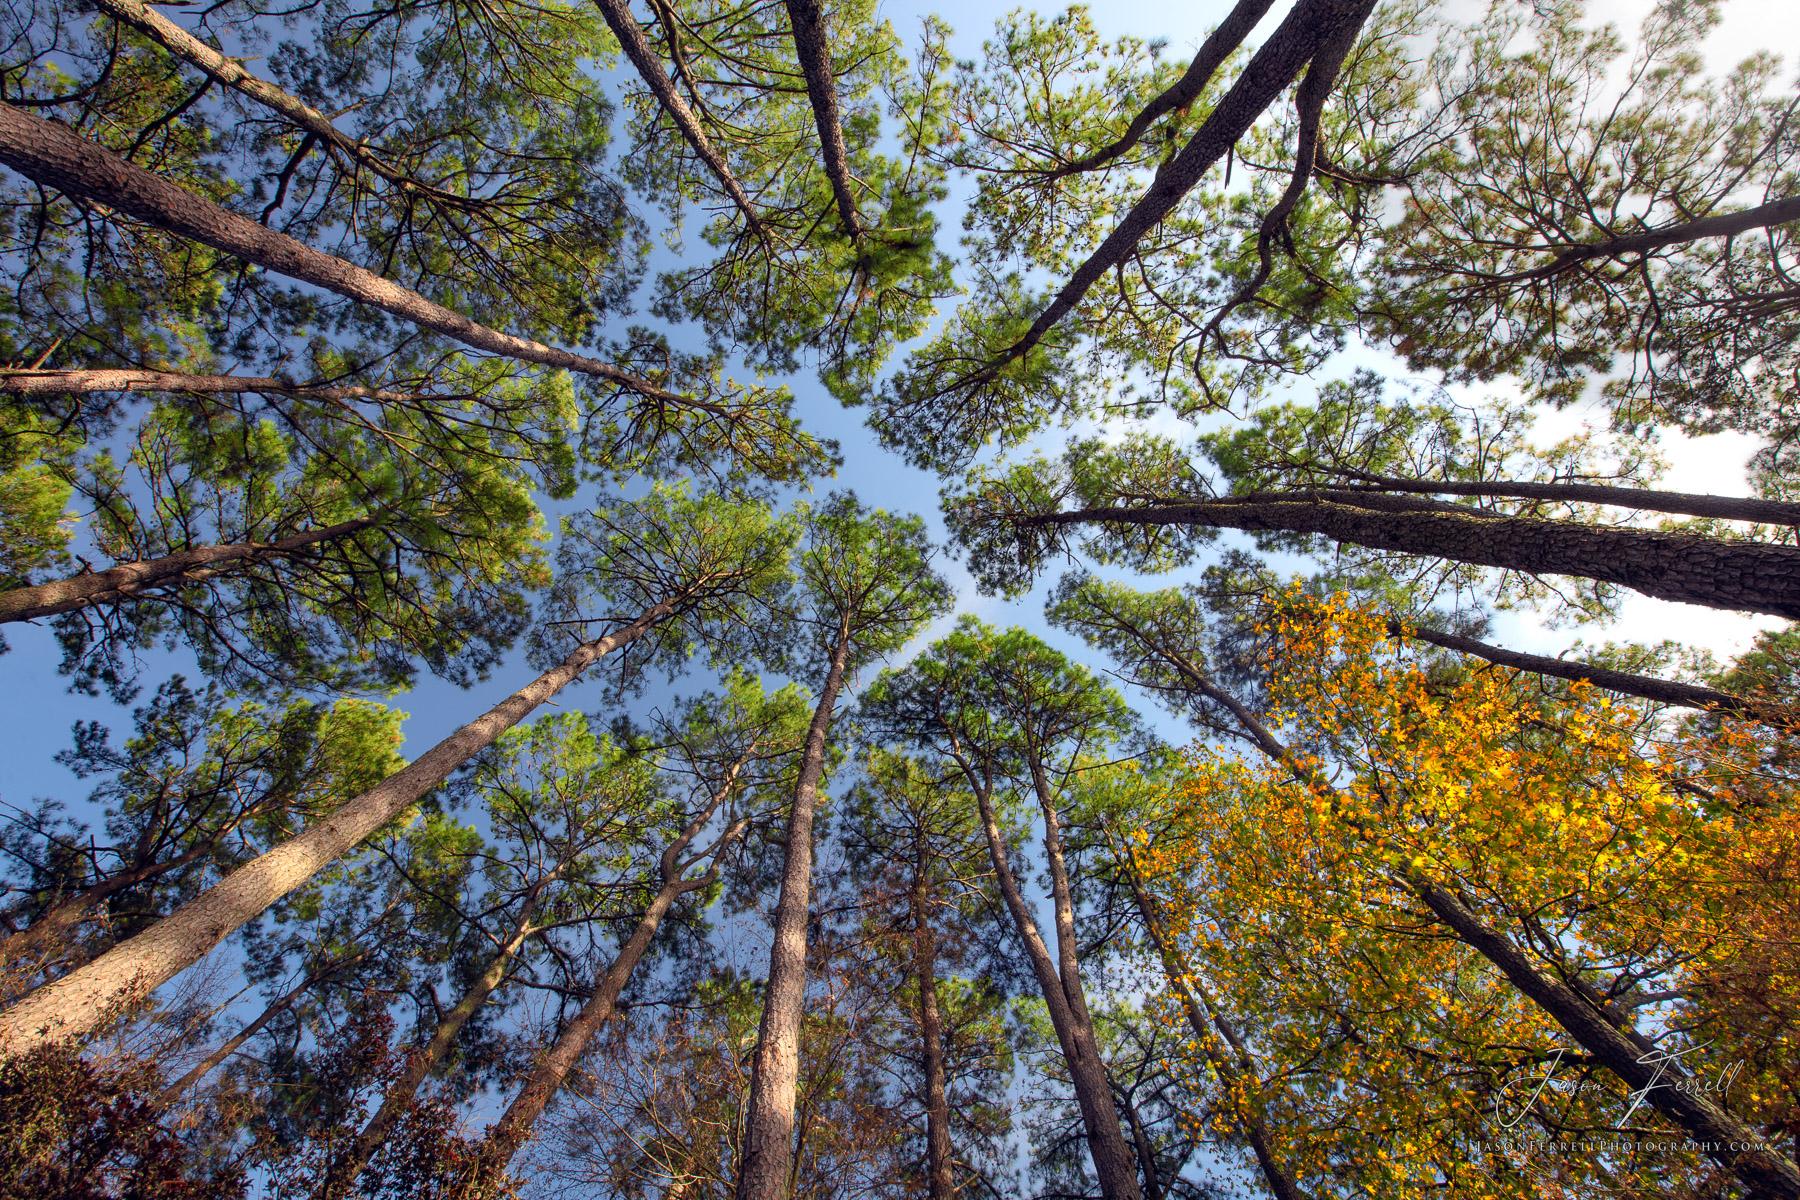 crown shyness, canopy, trees, phenomenon, species, photo